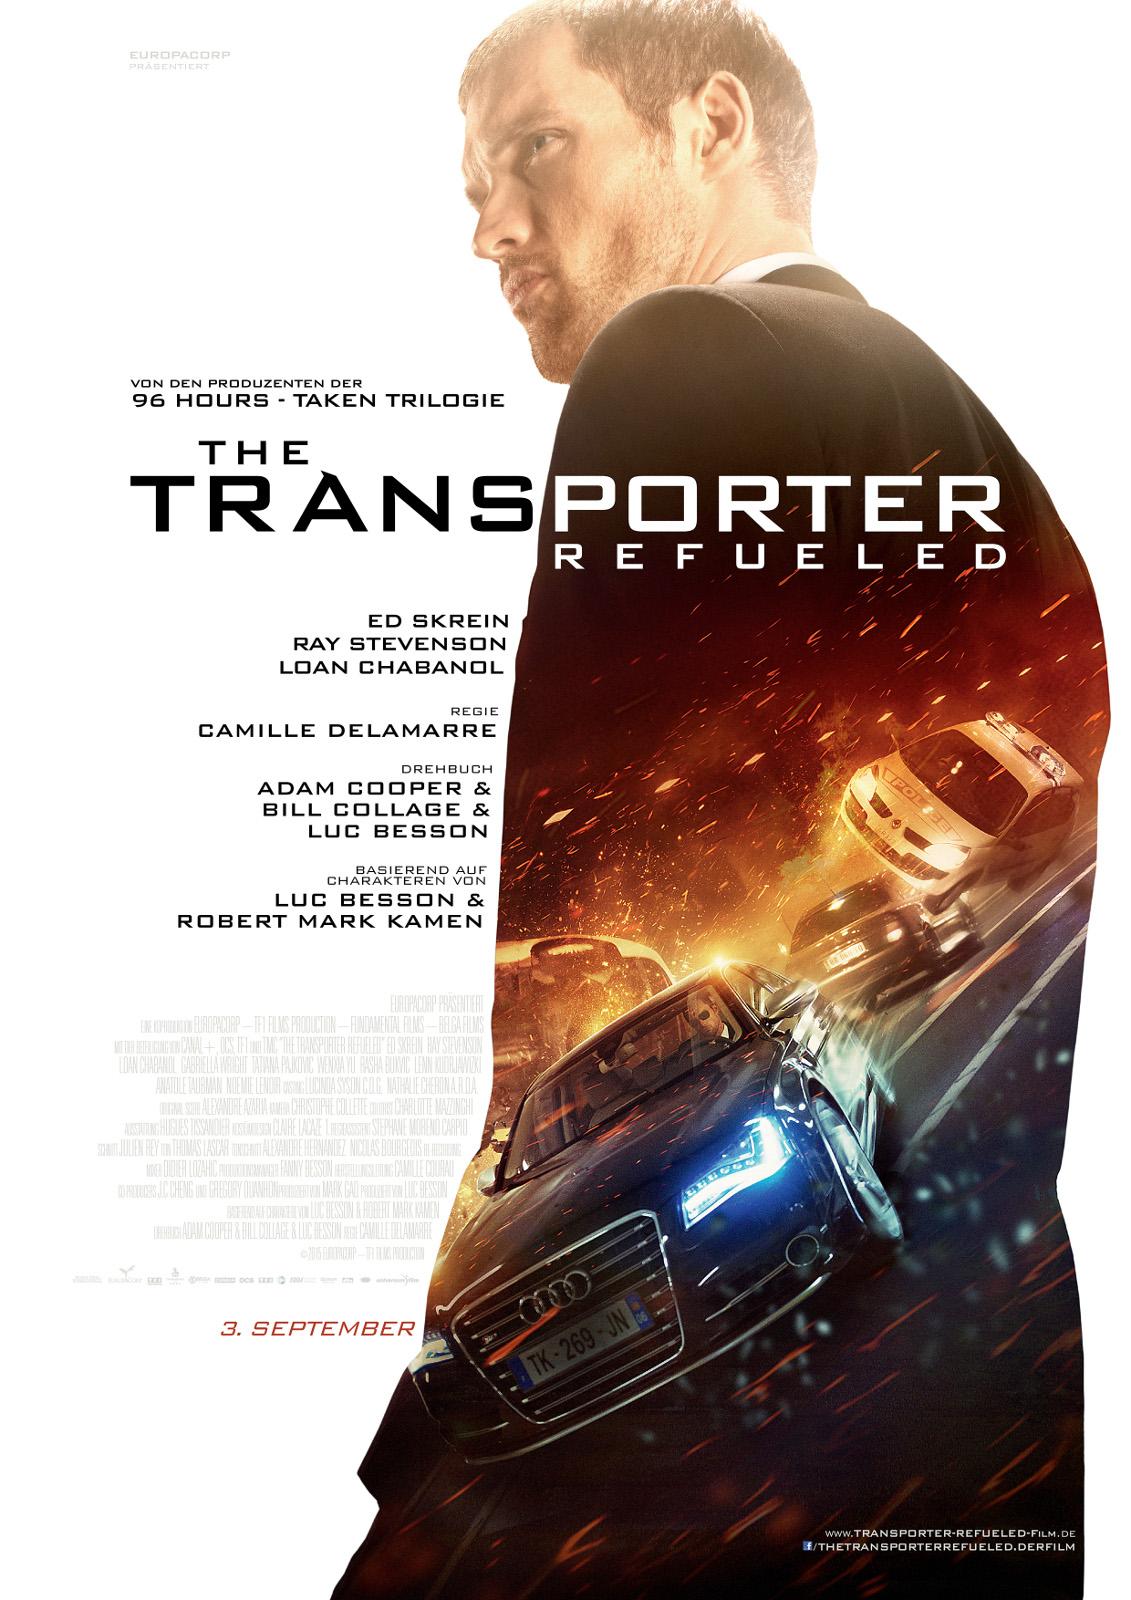 The Transporter 4 Refueled เดอะ ทรานสปอร์ตเตอร์ 4 [HD]